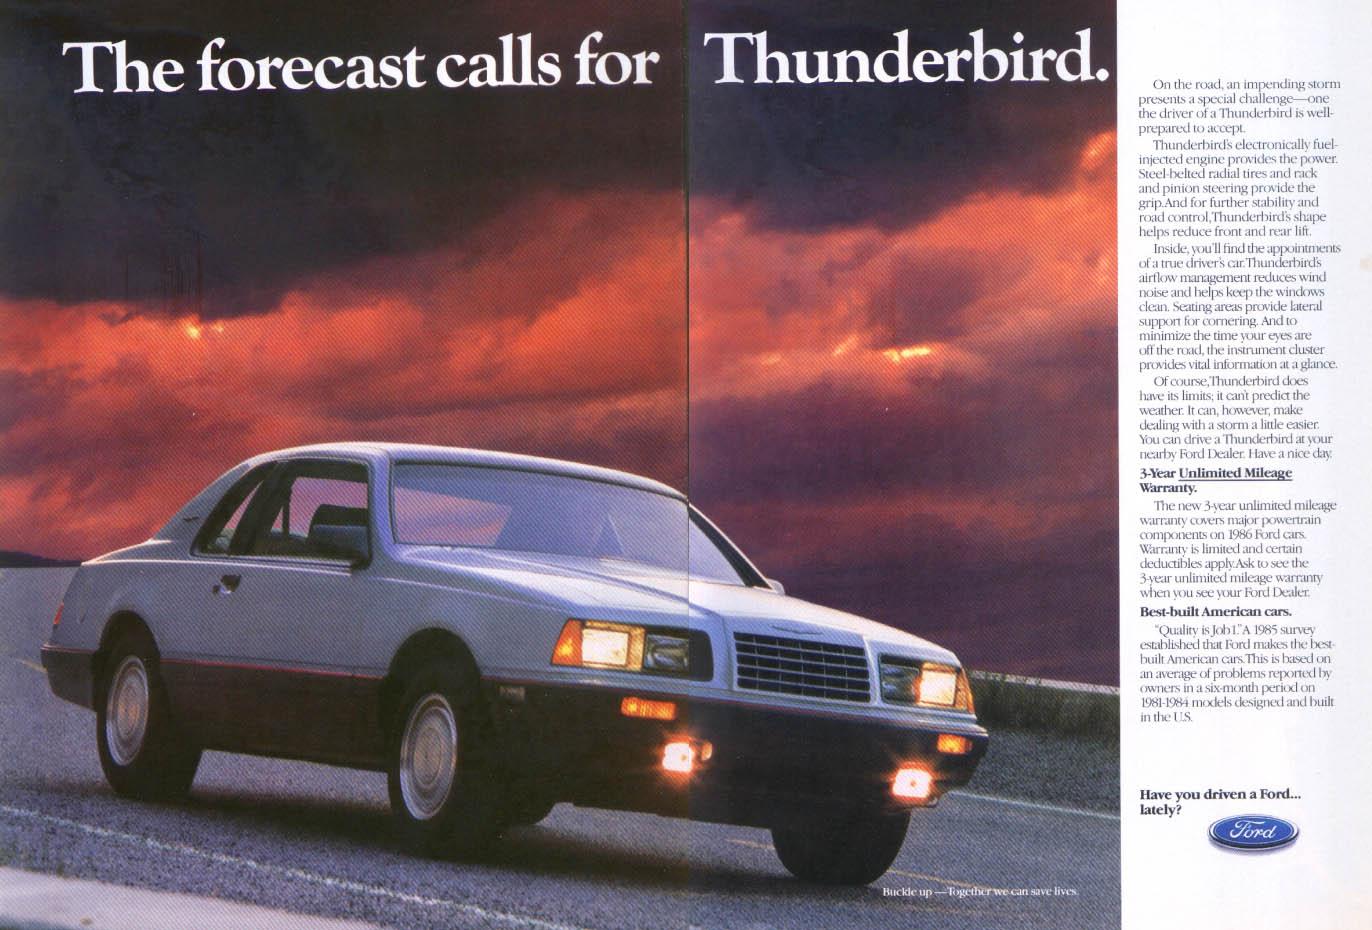 Image for Ford Thunderbird forecast calls for Thunder ad 1986